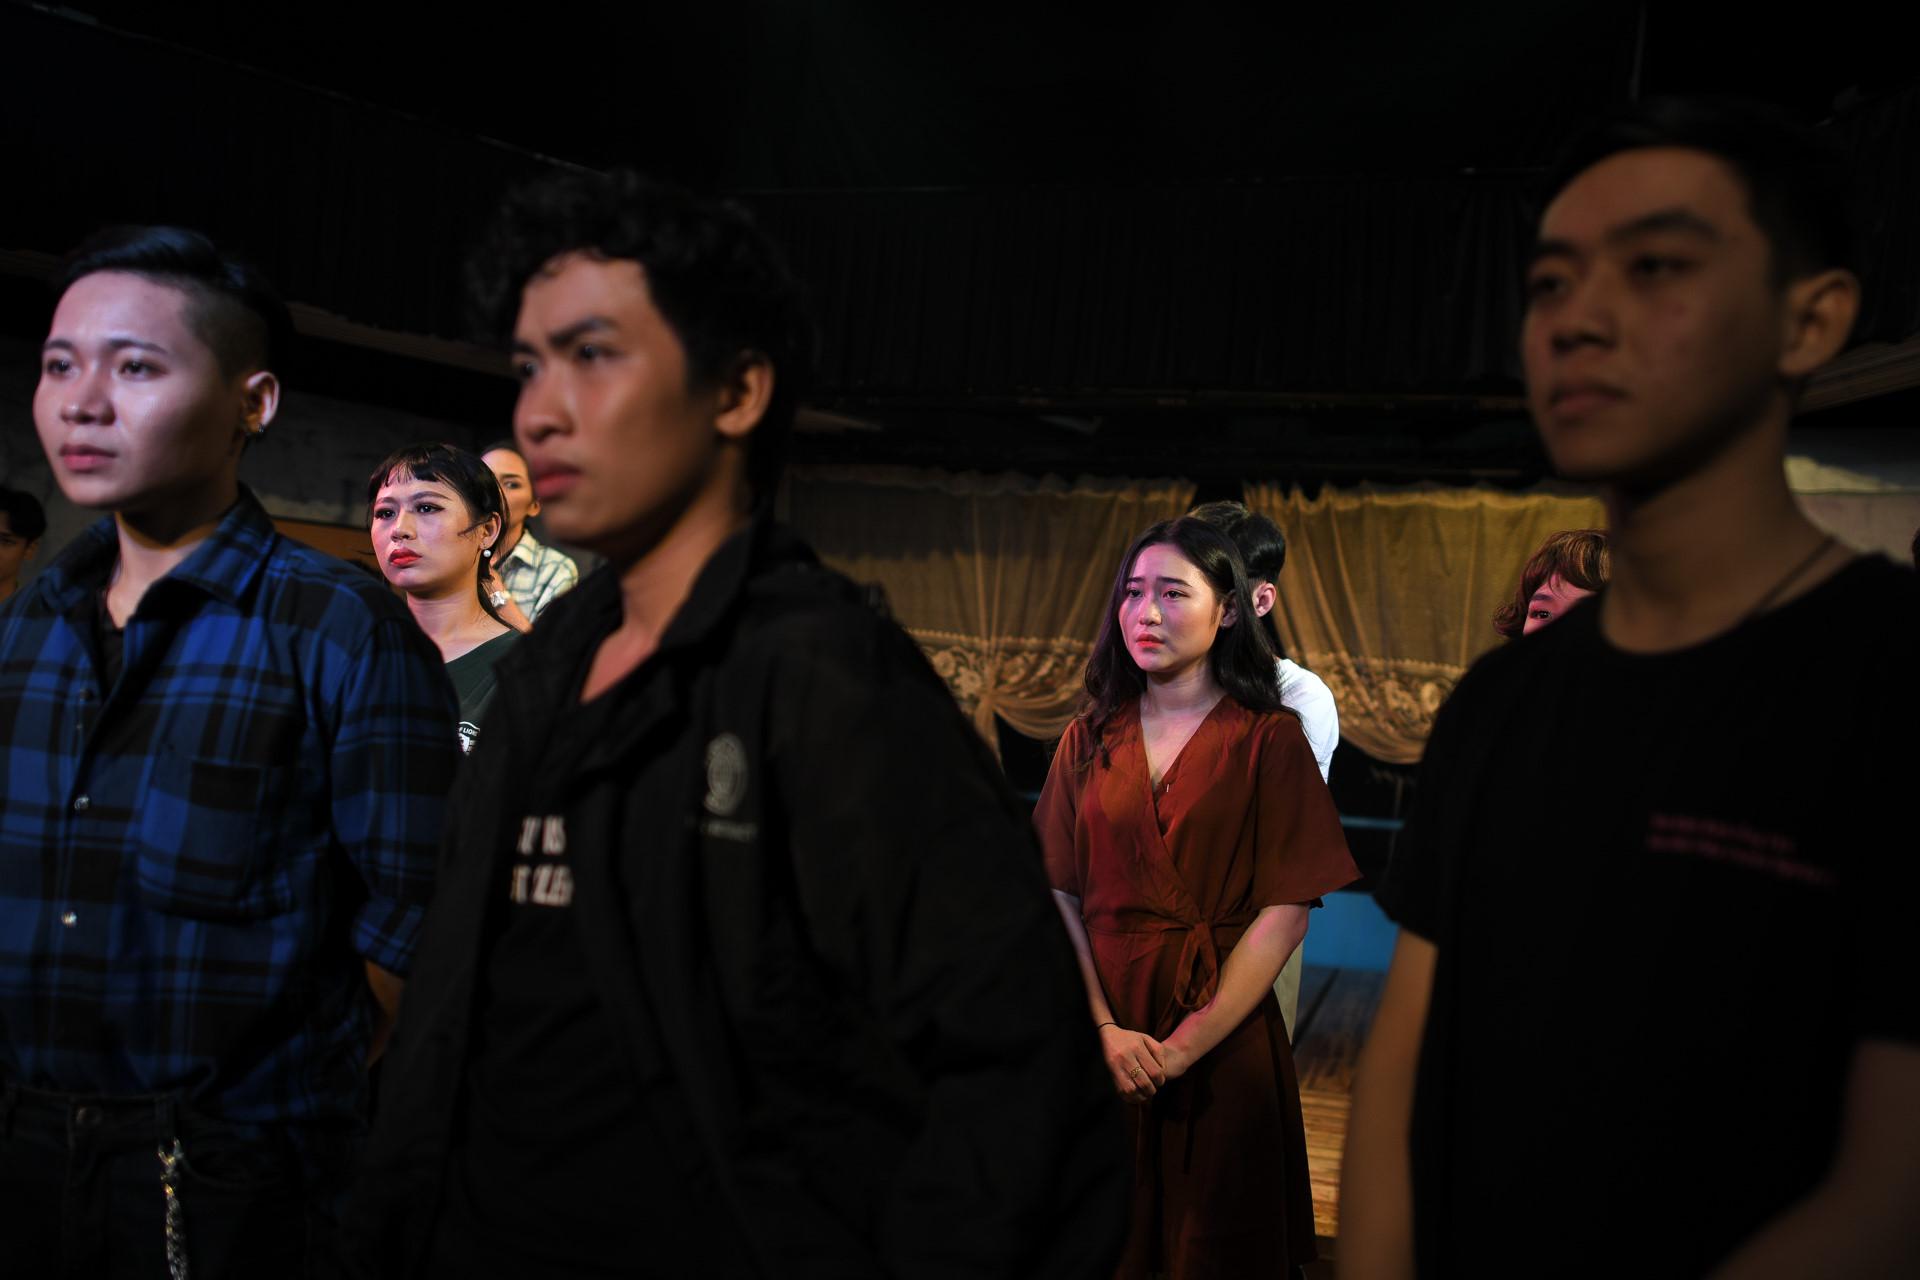 Dem dien cuoi o san khau Hong Van: Chuyen sau tam man nhung hinh anh 29